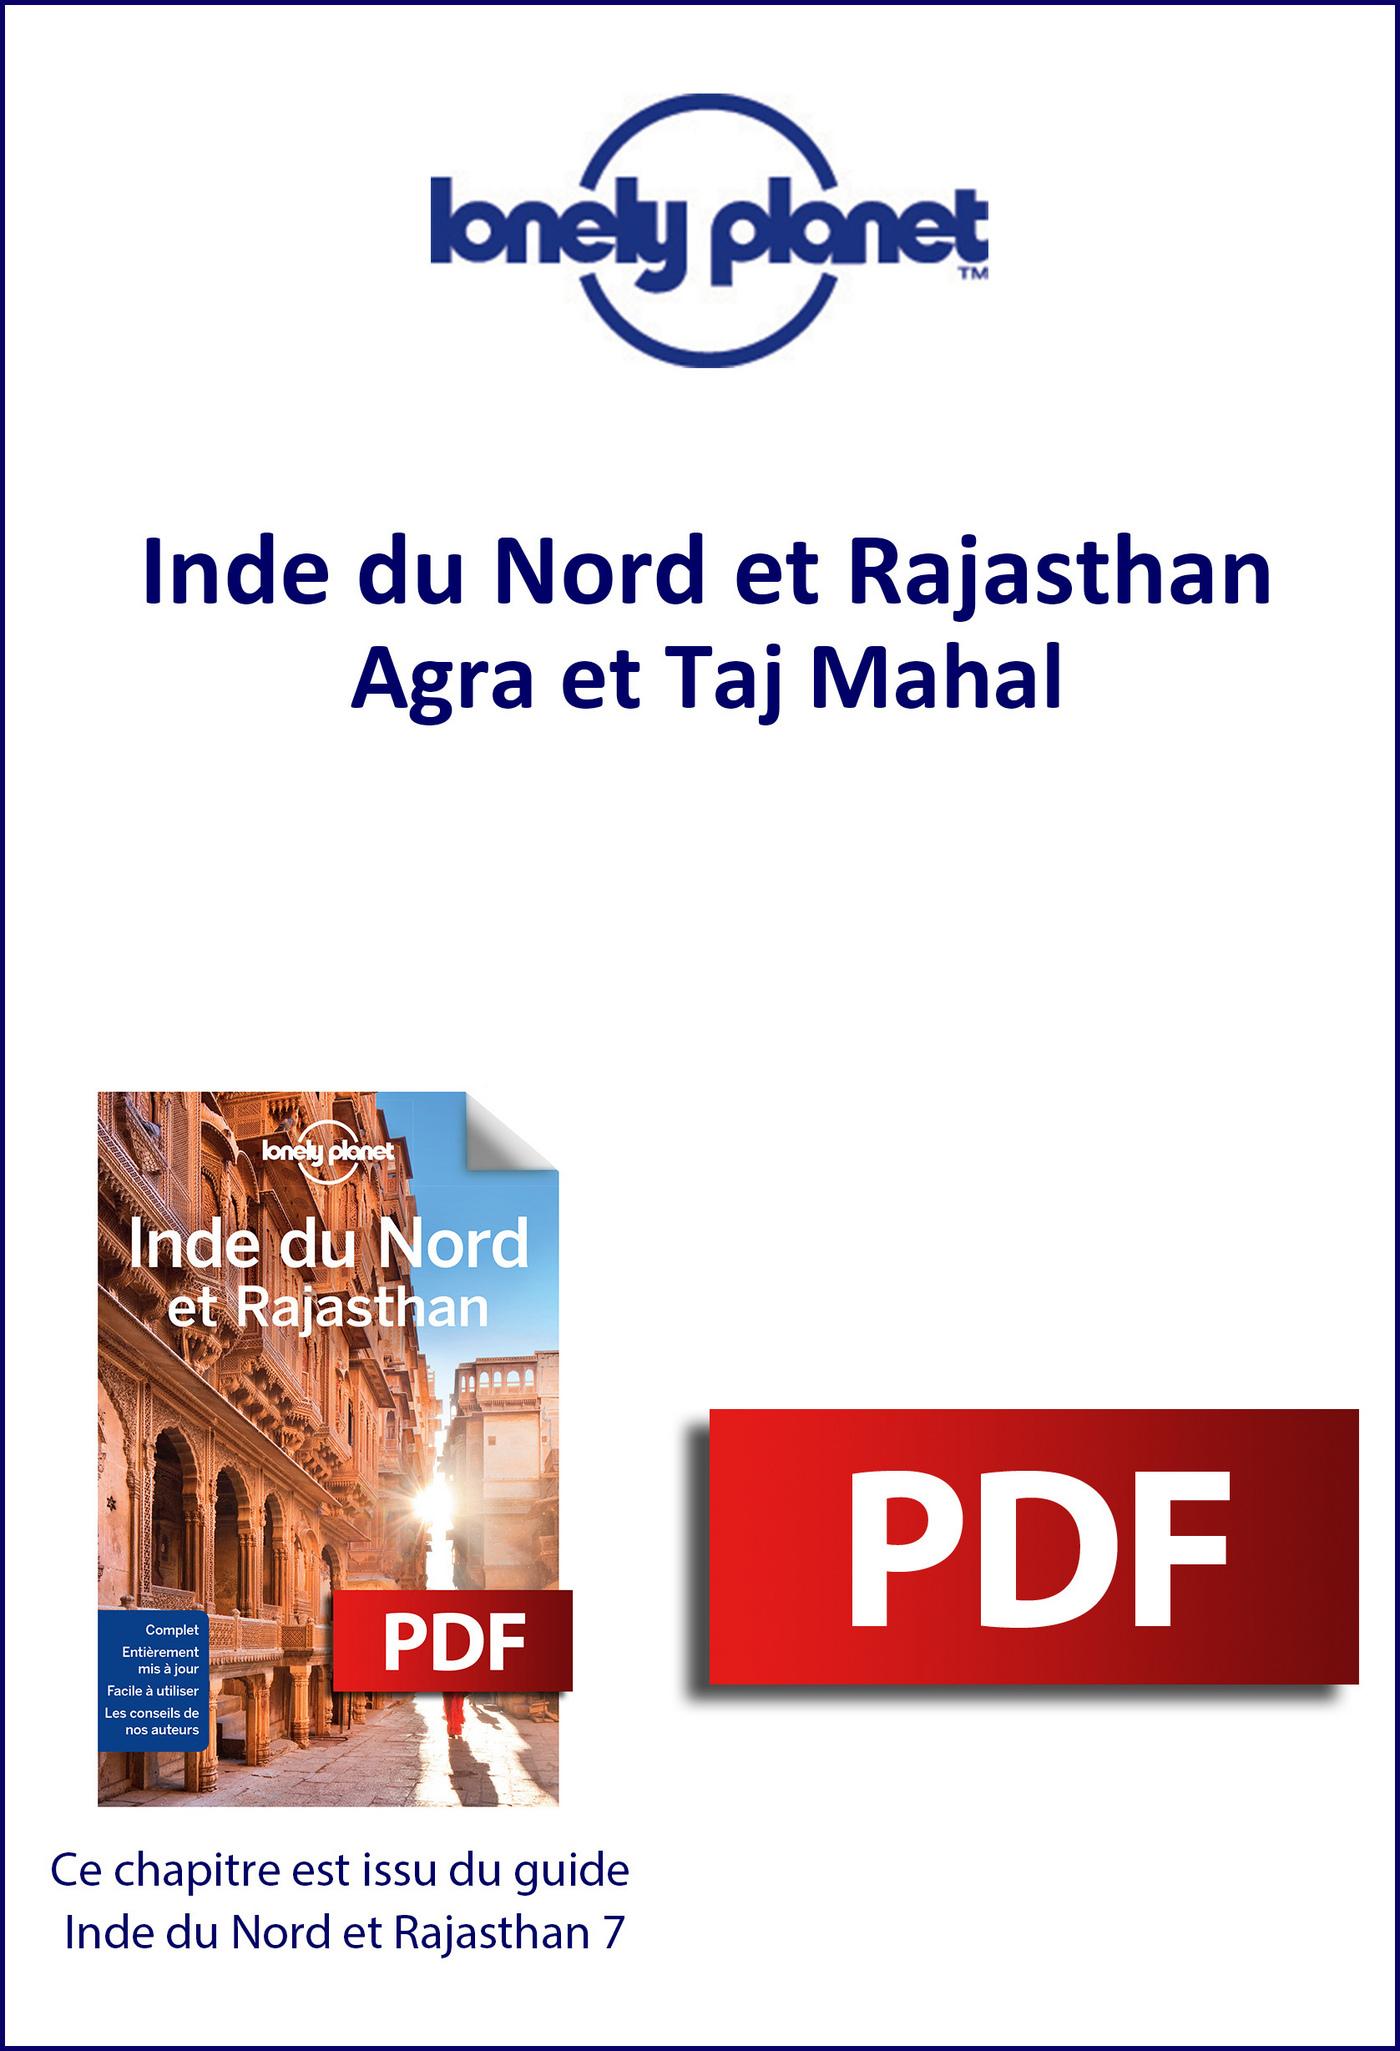 Inde du Nord - Agra et Taj Mahal